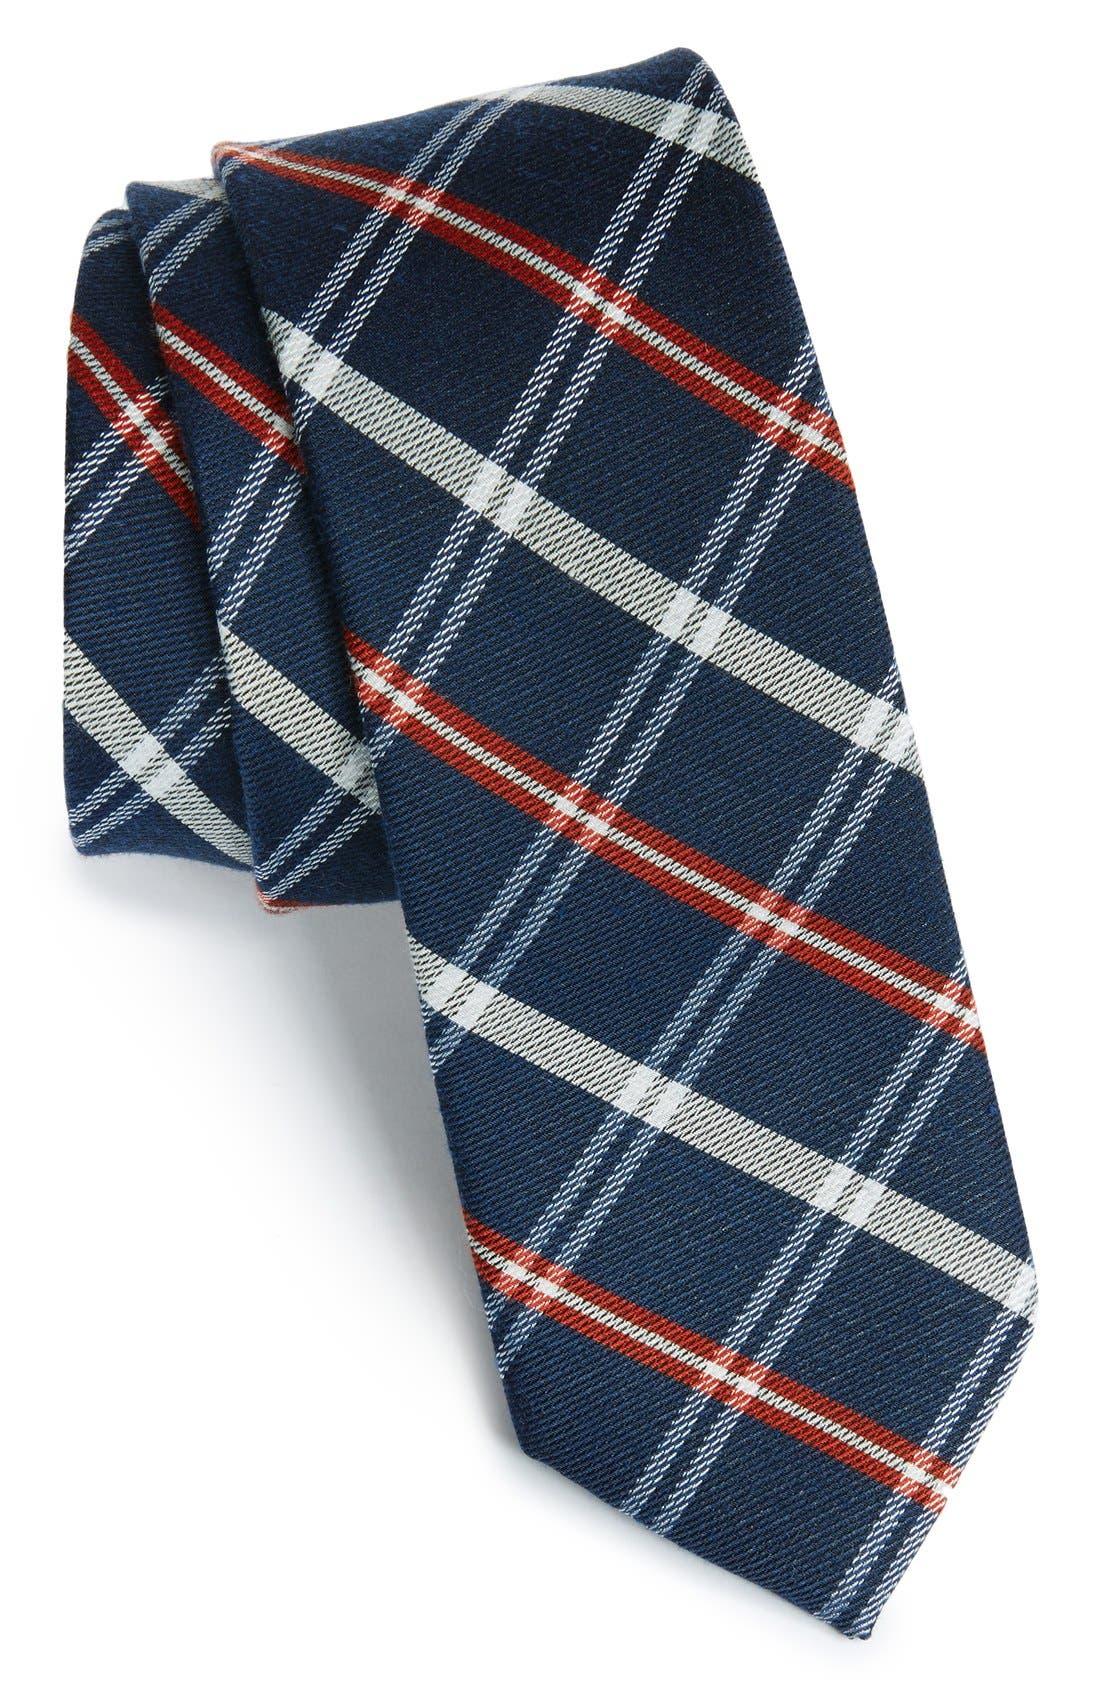 'Logan' Plaid Tie,                             Main thumbnail 1, color,                             Navy